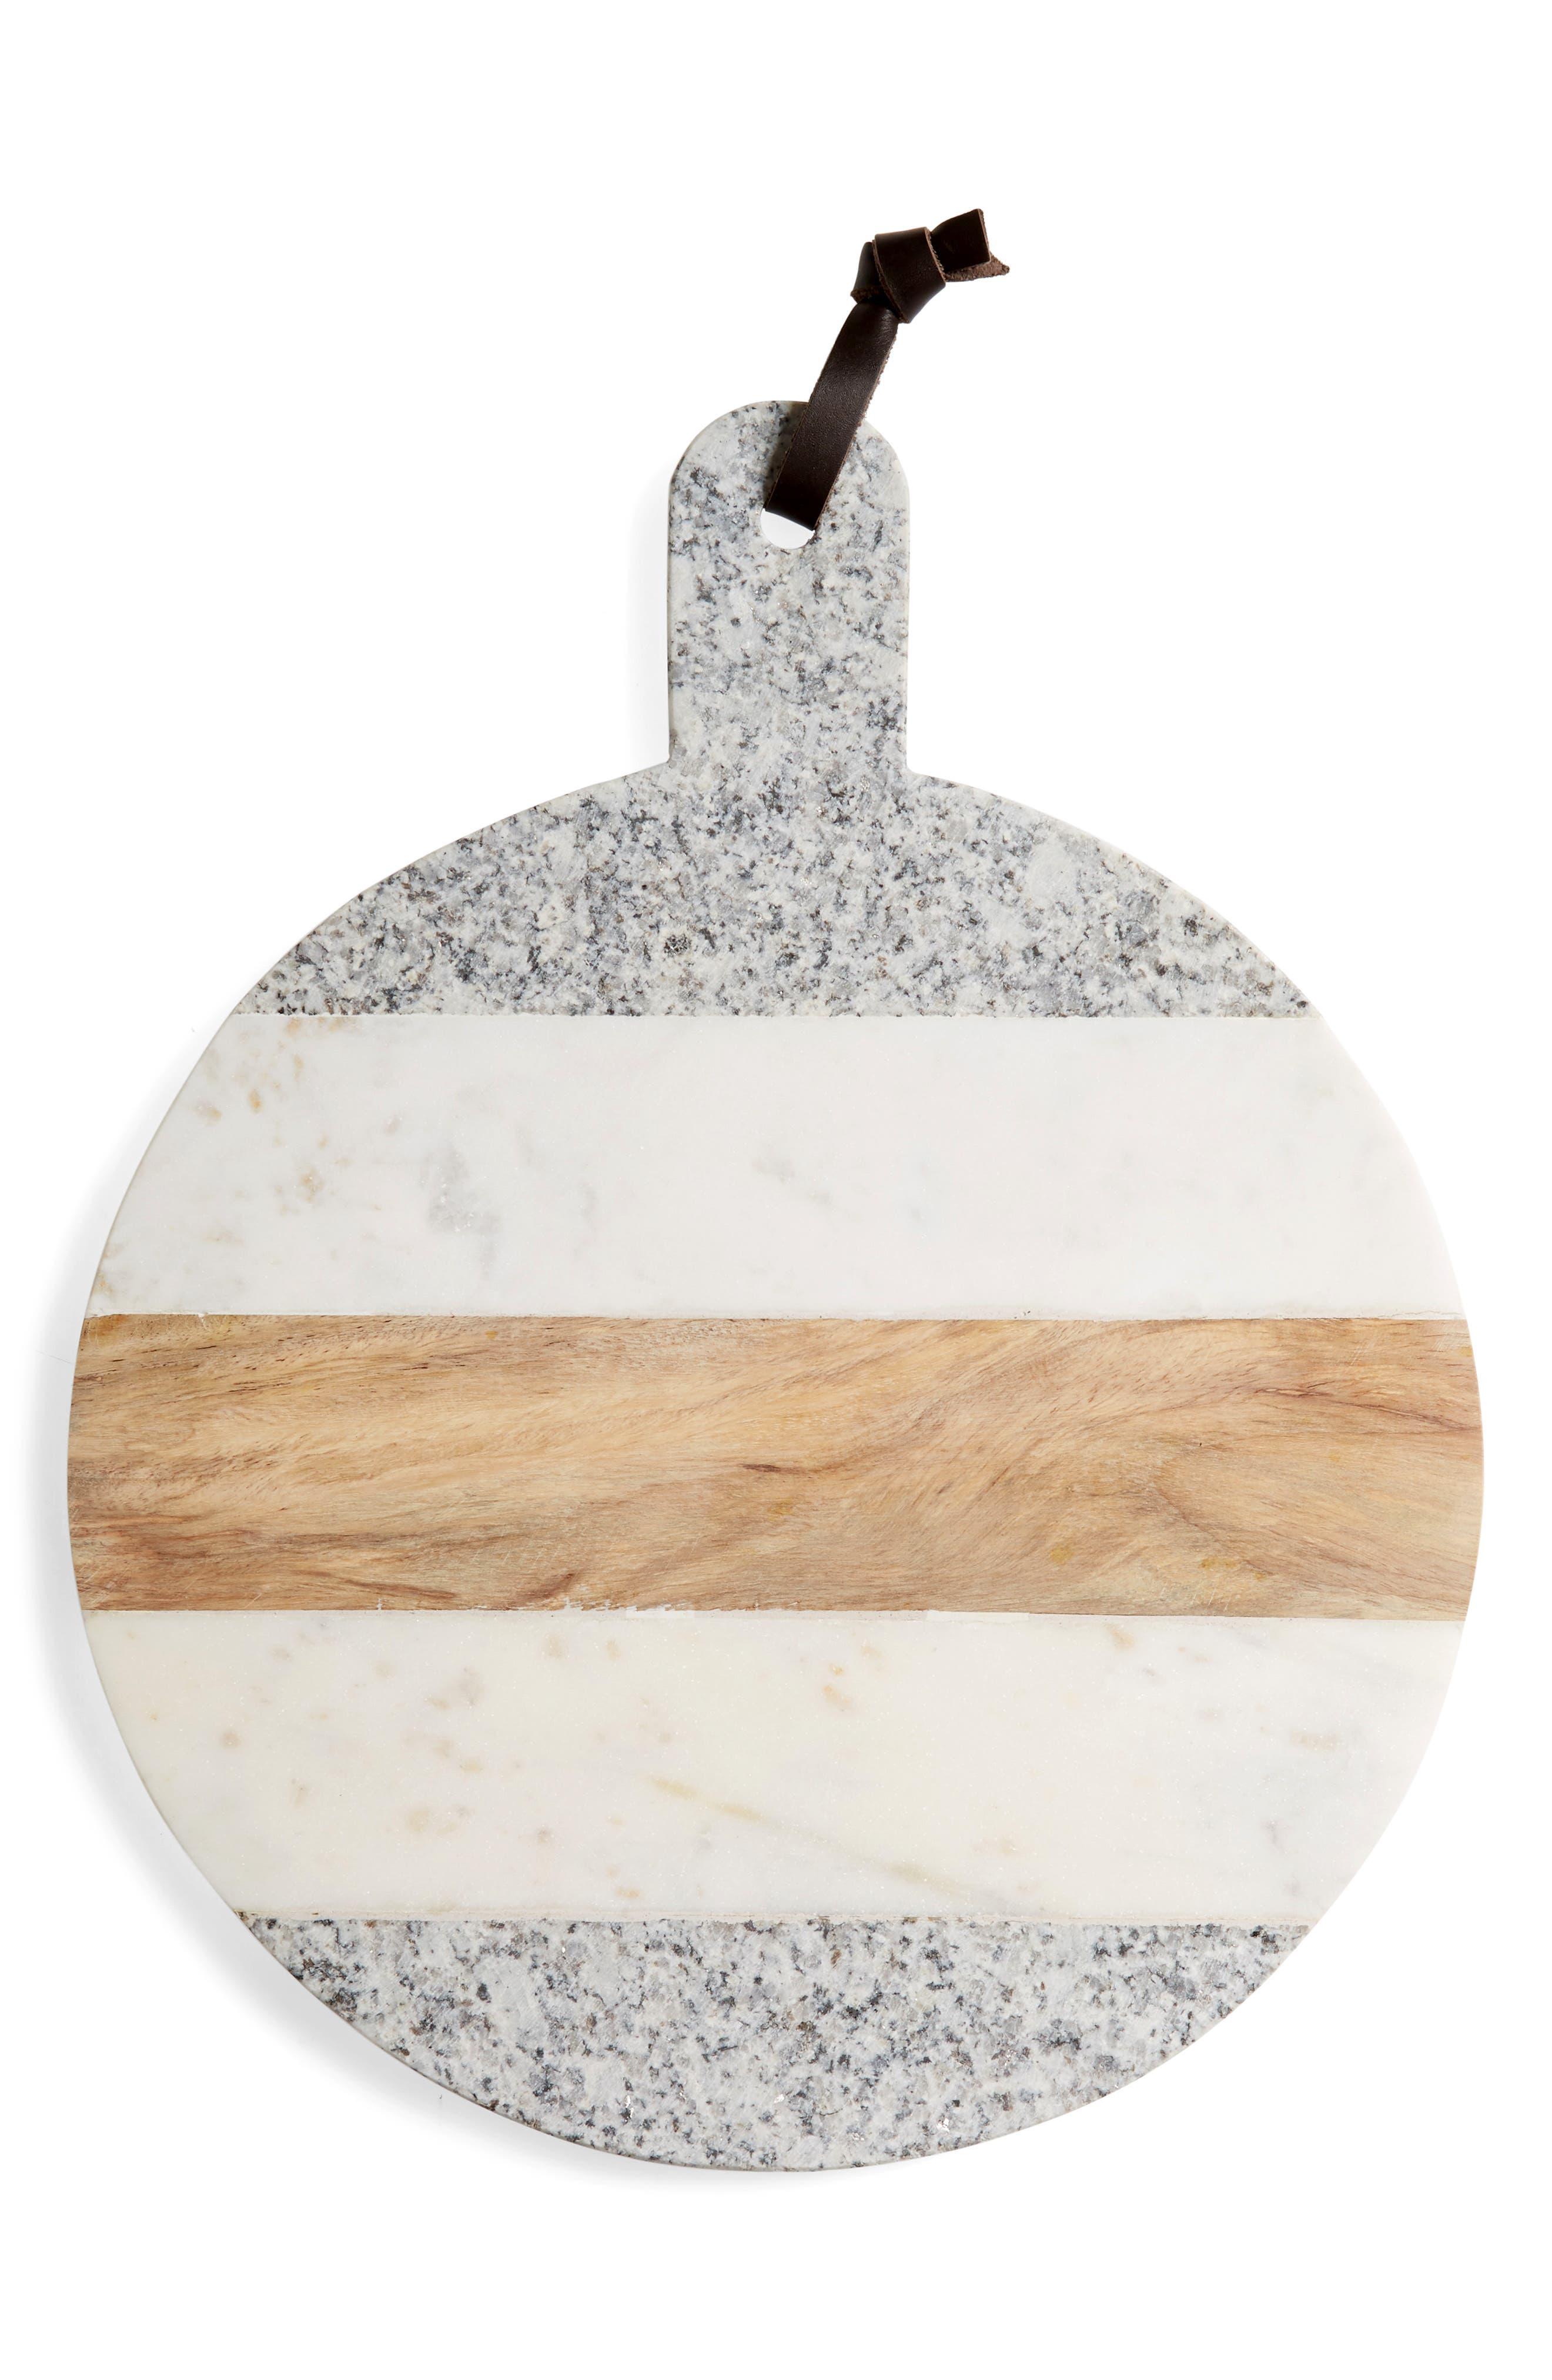 Marble, Wood & Granite Round Board,                             Main thumbnail 1, color,                             020